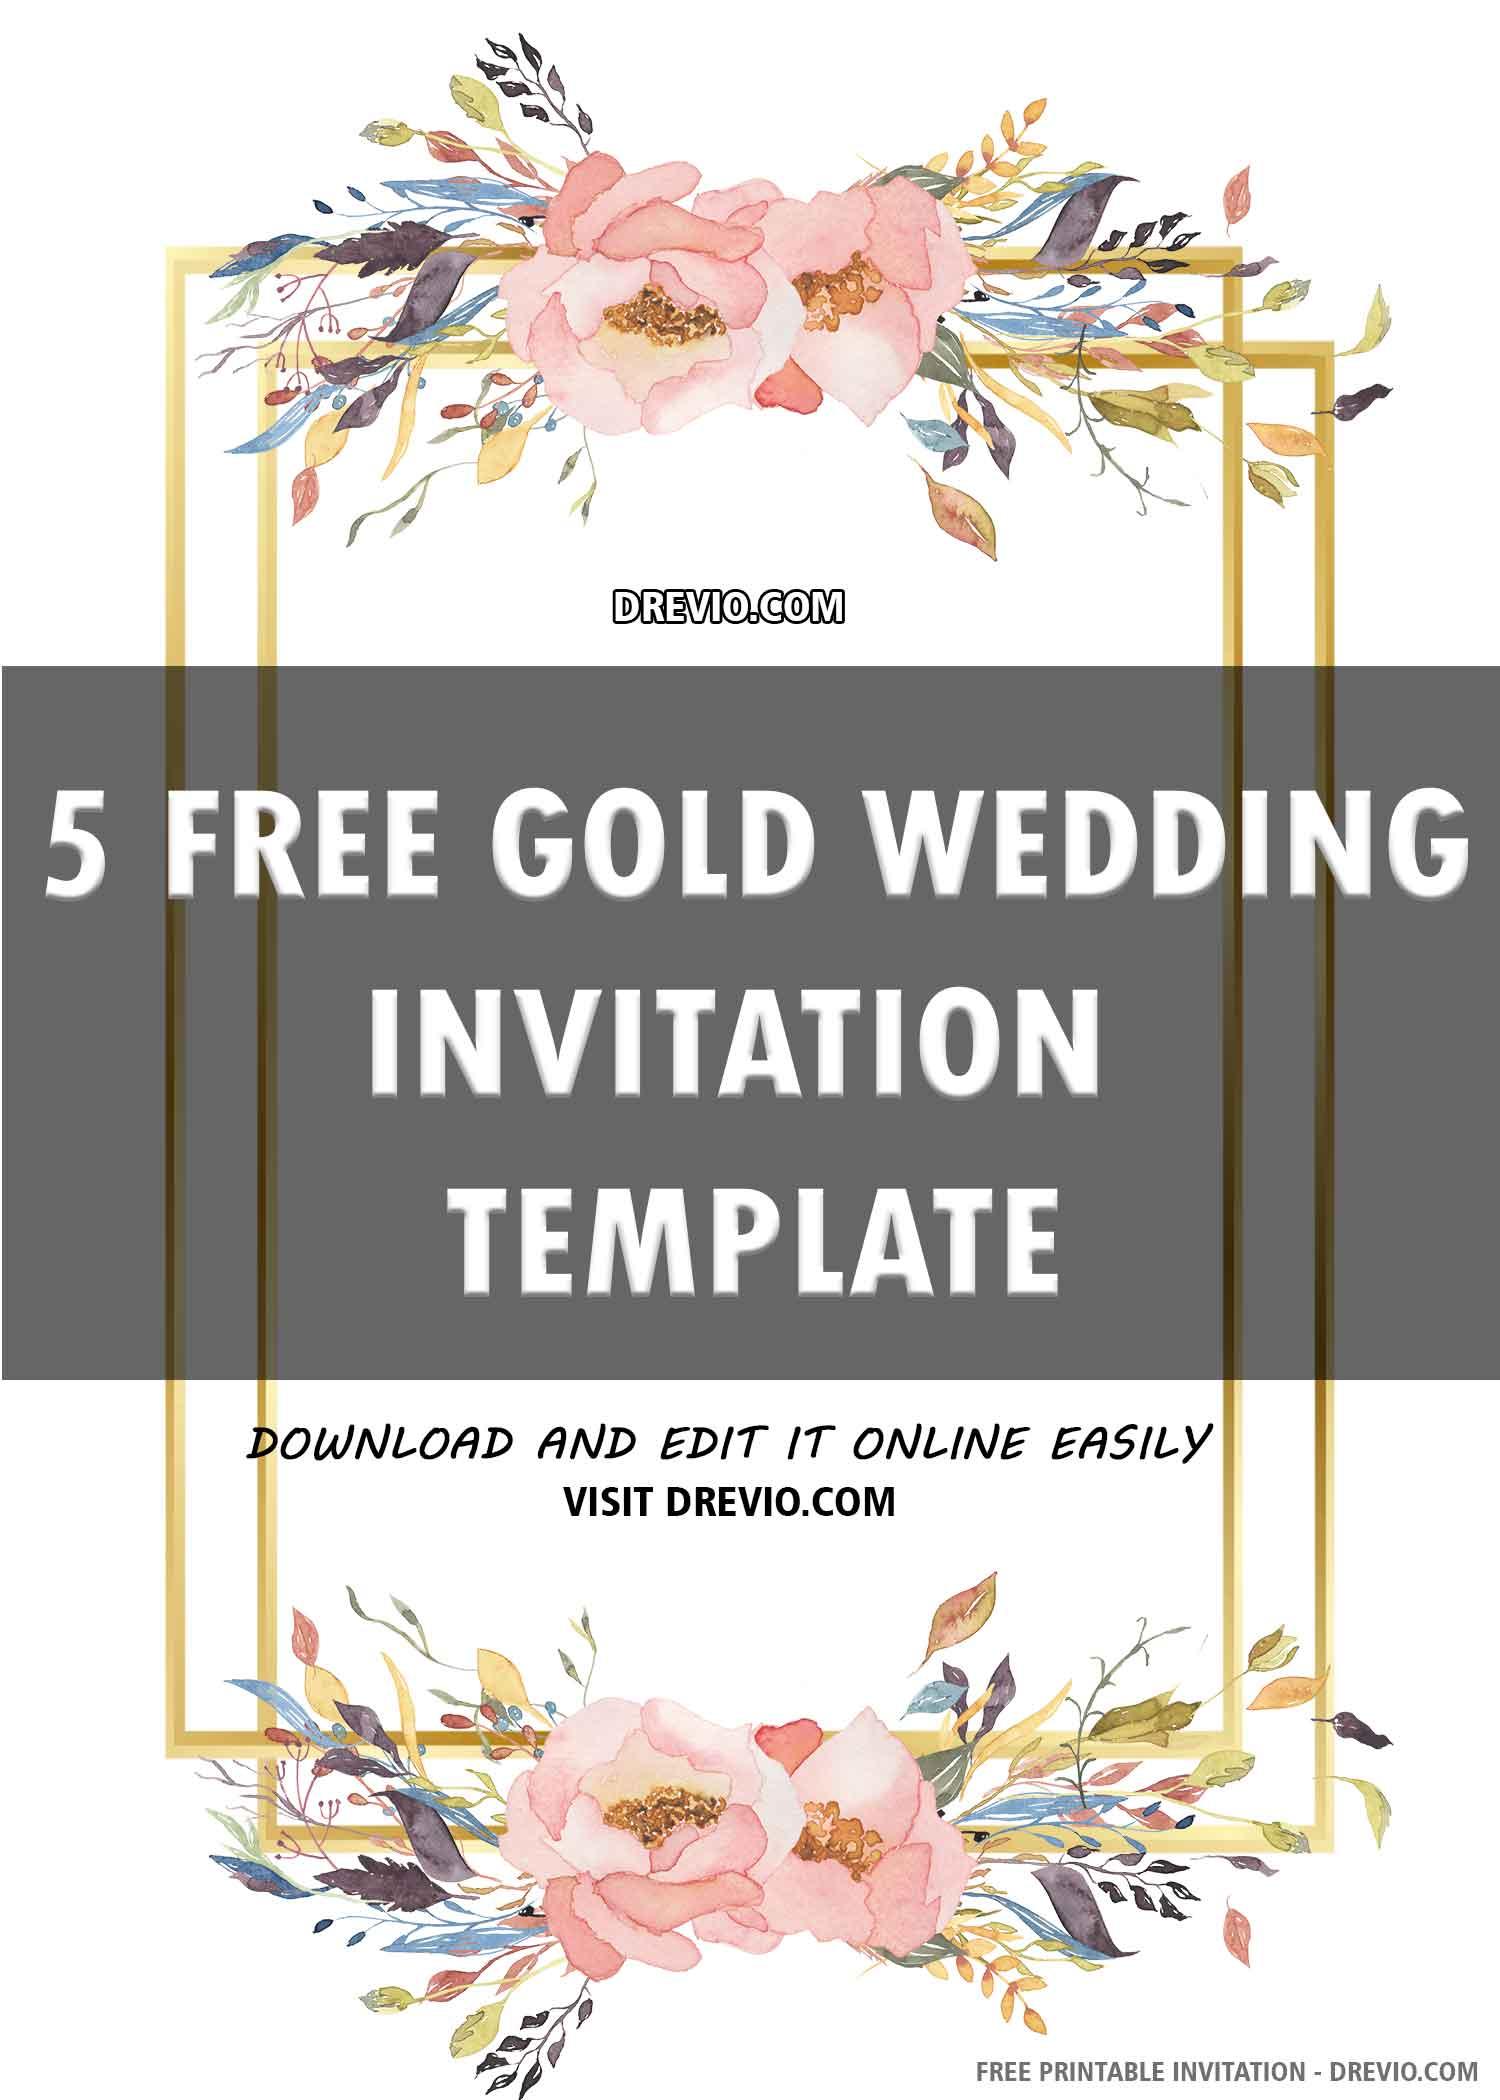 Free Printable Gold Wedding Invitation Template